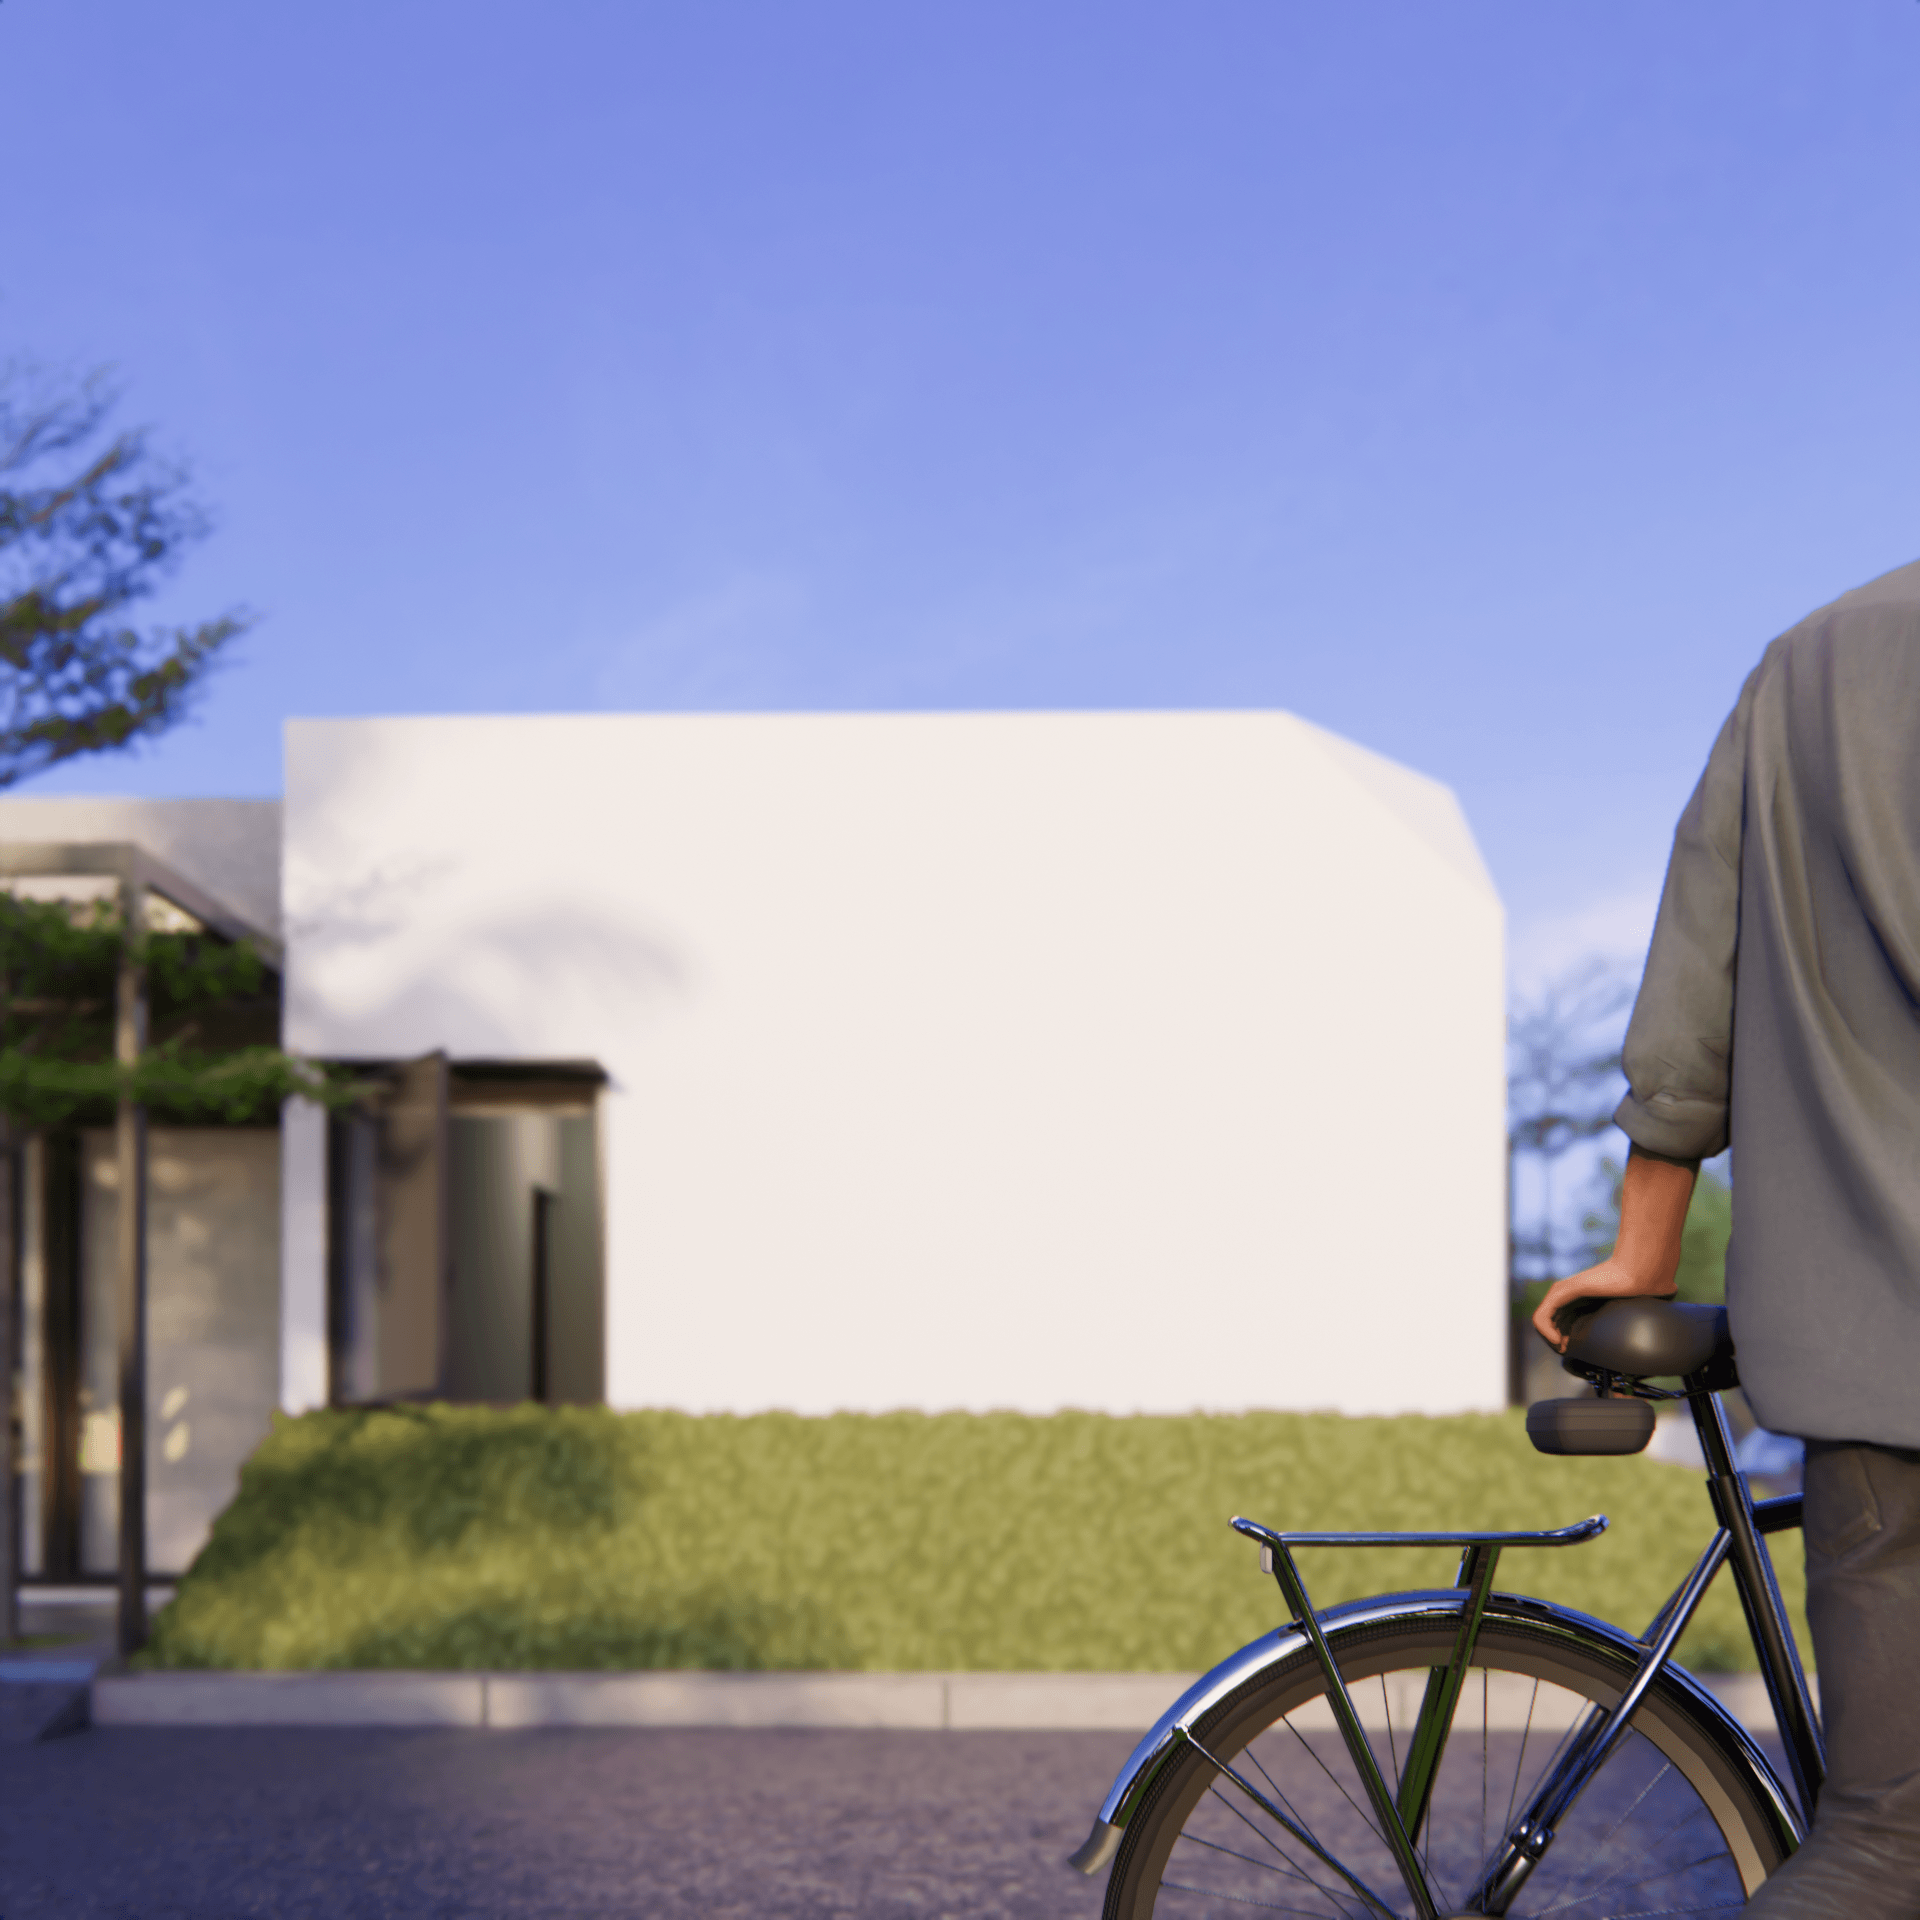 Aplusarchitect Indonesia Indera House Jl. Laurel, Grand Cilegon Residence, Cibeber, Cilegon City, Banten 42426, Indonesia Jl. Laurel, Grand Cilegon Residence, Cibeber, Cilegon City, Banten 42426, Indonesia Aplusarchitect-Indonesia-Indera-House  129010